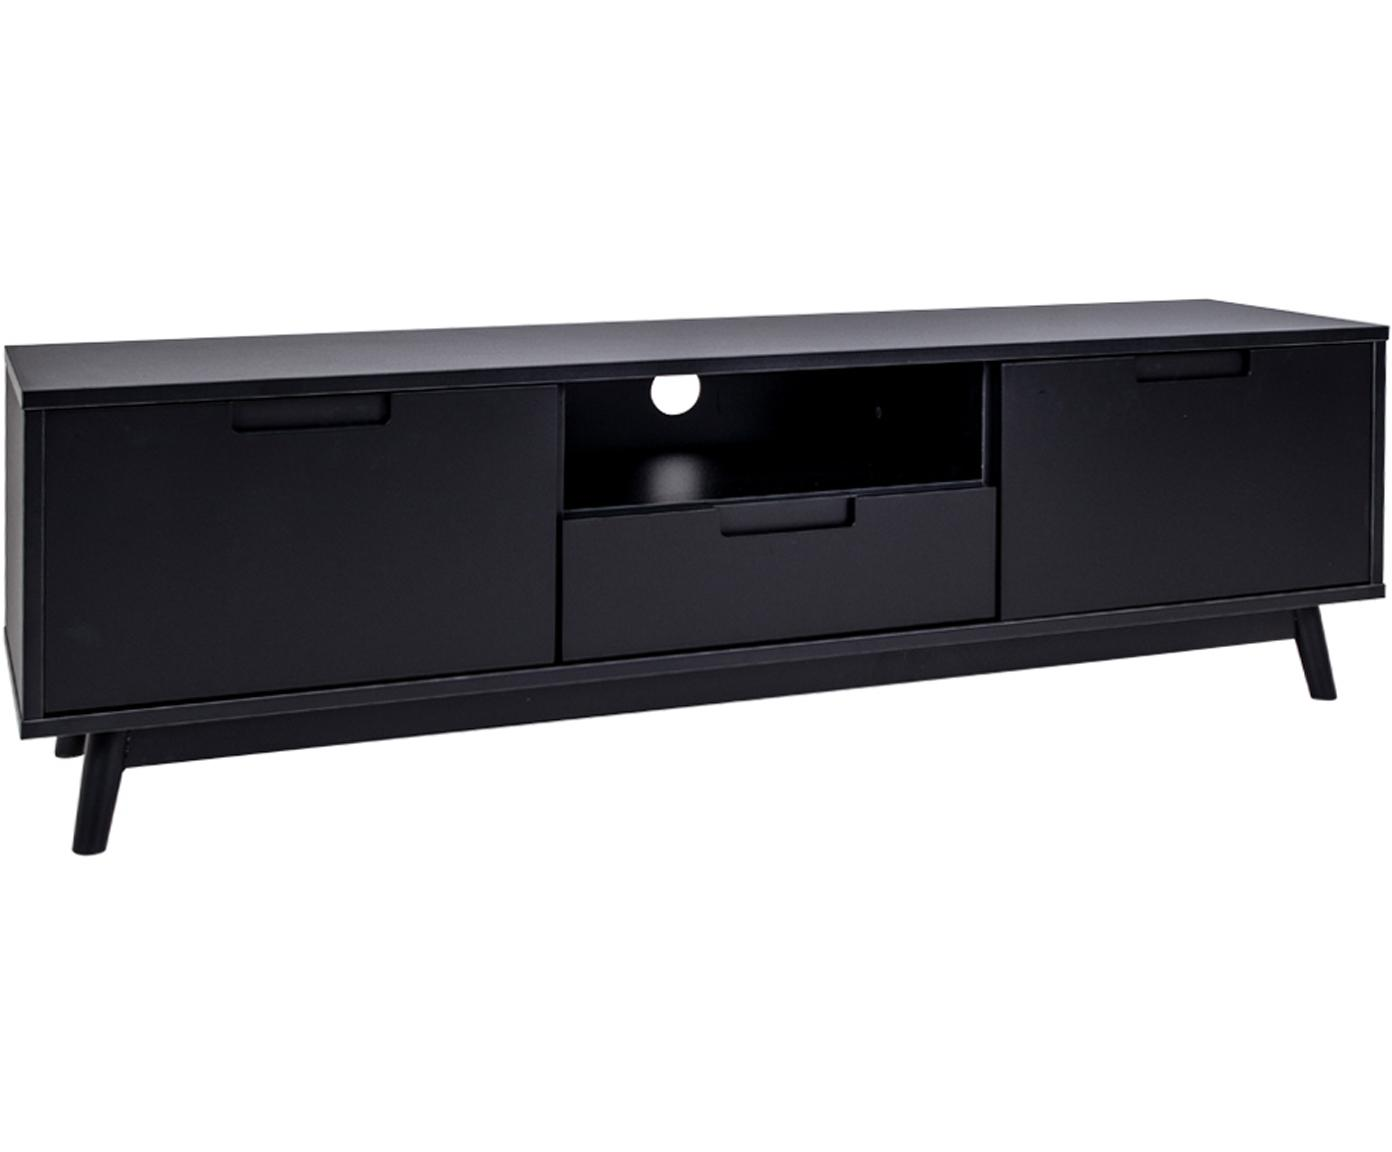 Mueble TV de madera de pino Copenhagen, Estructura: tablero de fibras de dens, Patas: madera de pino, Negro, An 150 x Al 46 cm